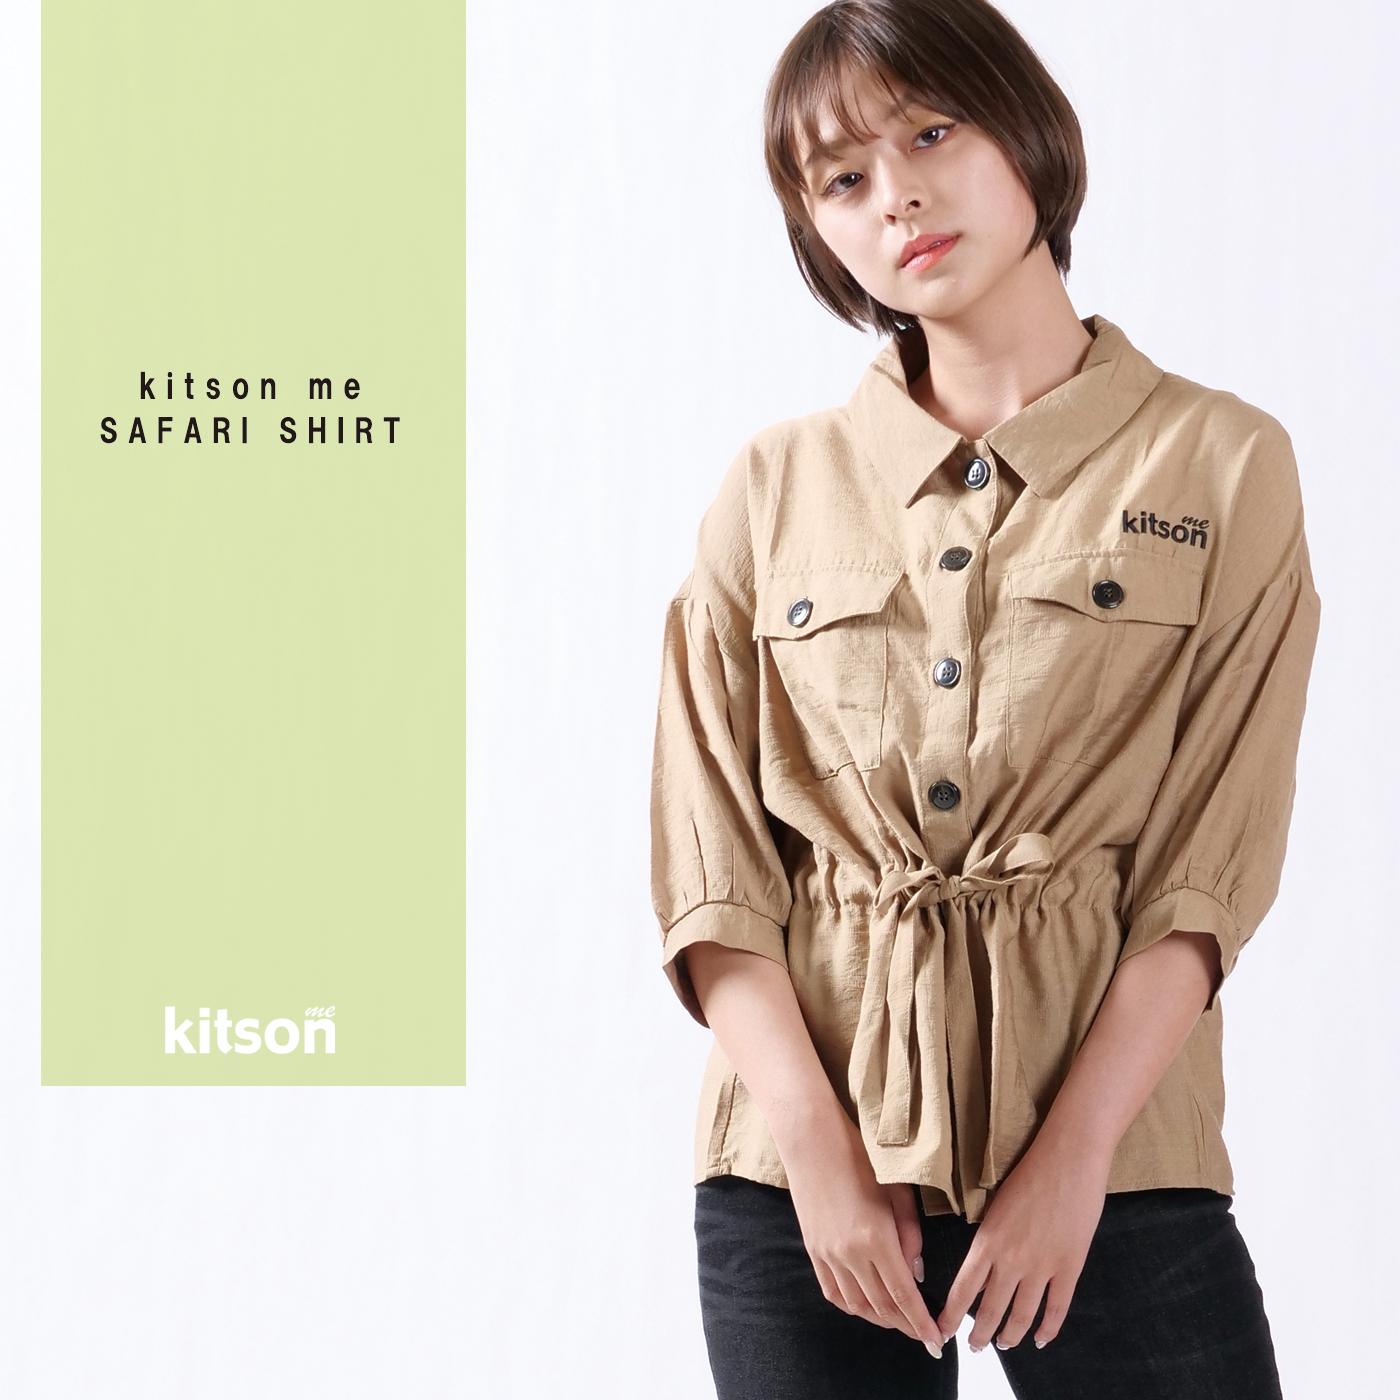 kitson me サファリシャツ